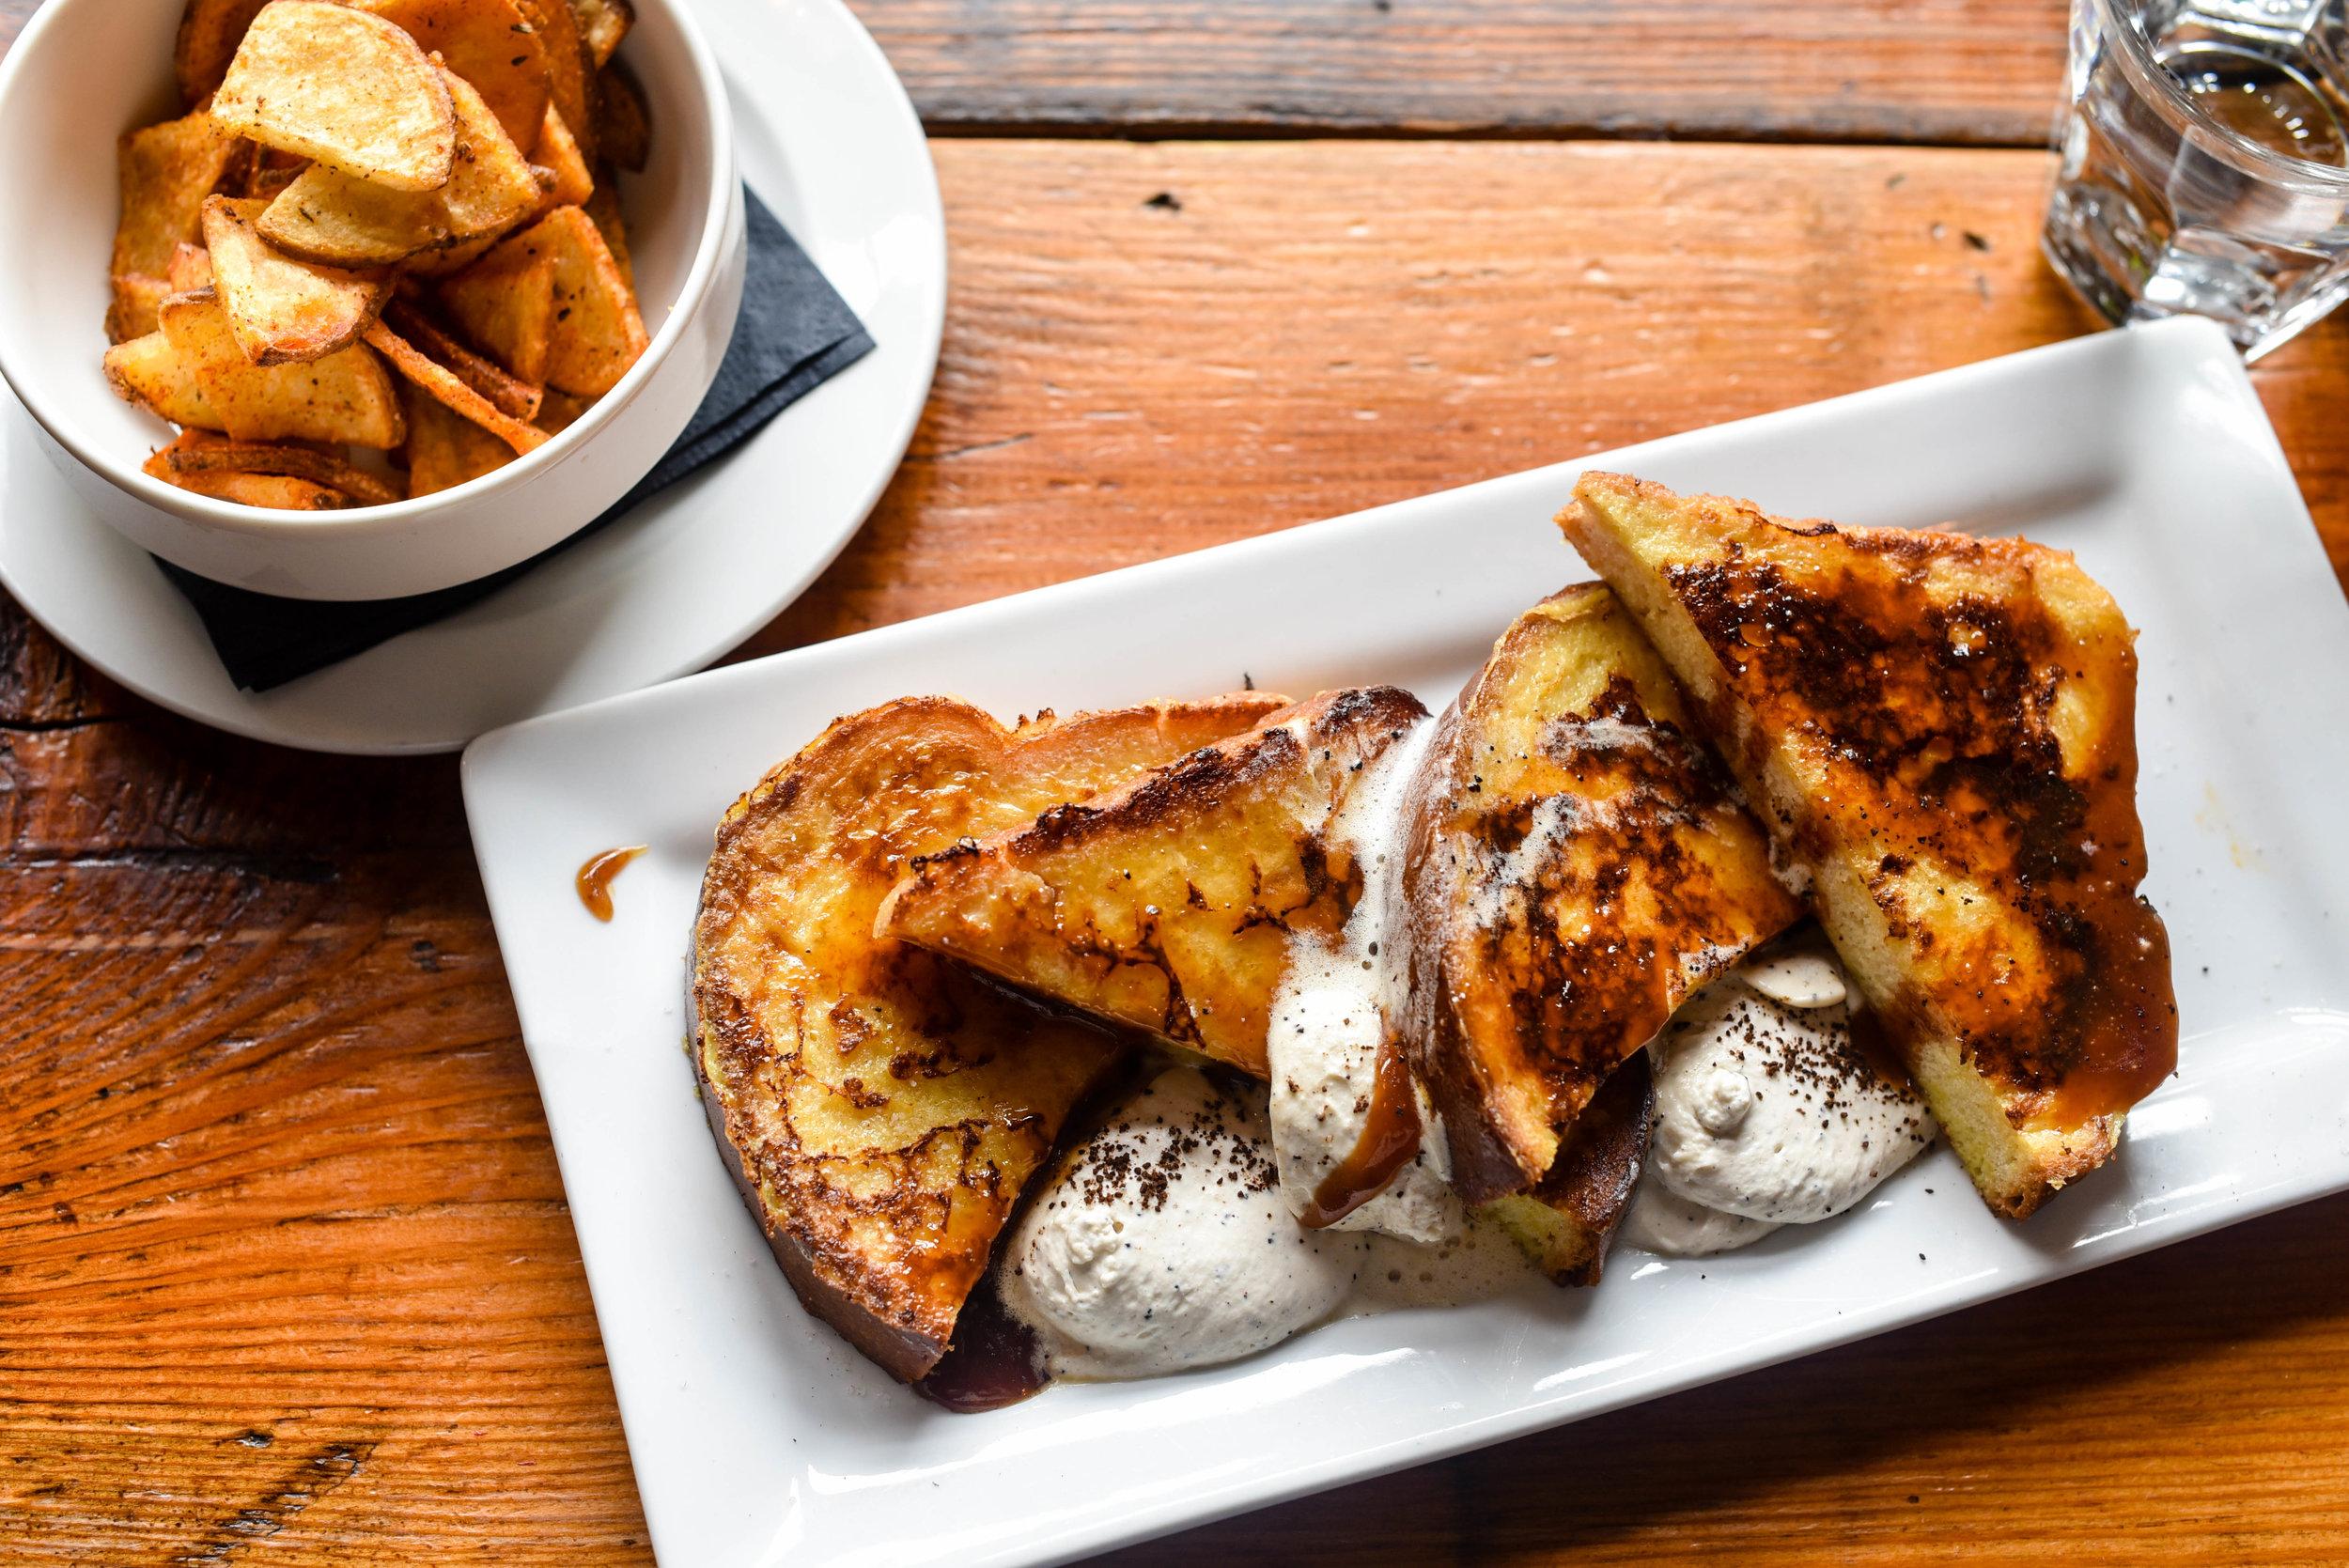 salted caramel brioche french toast